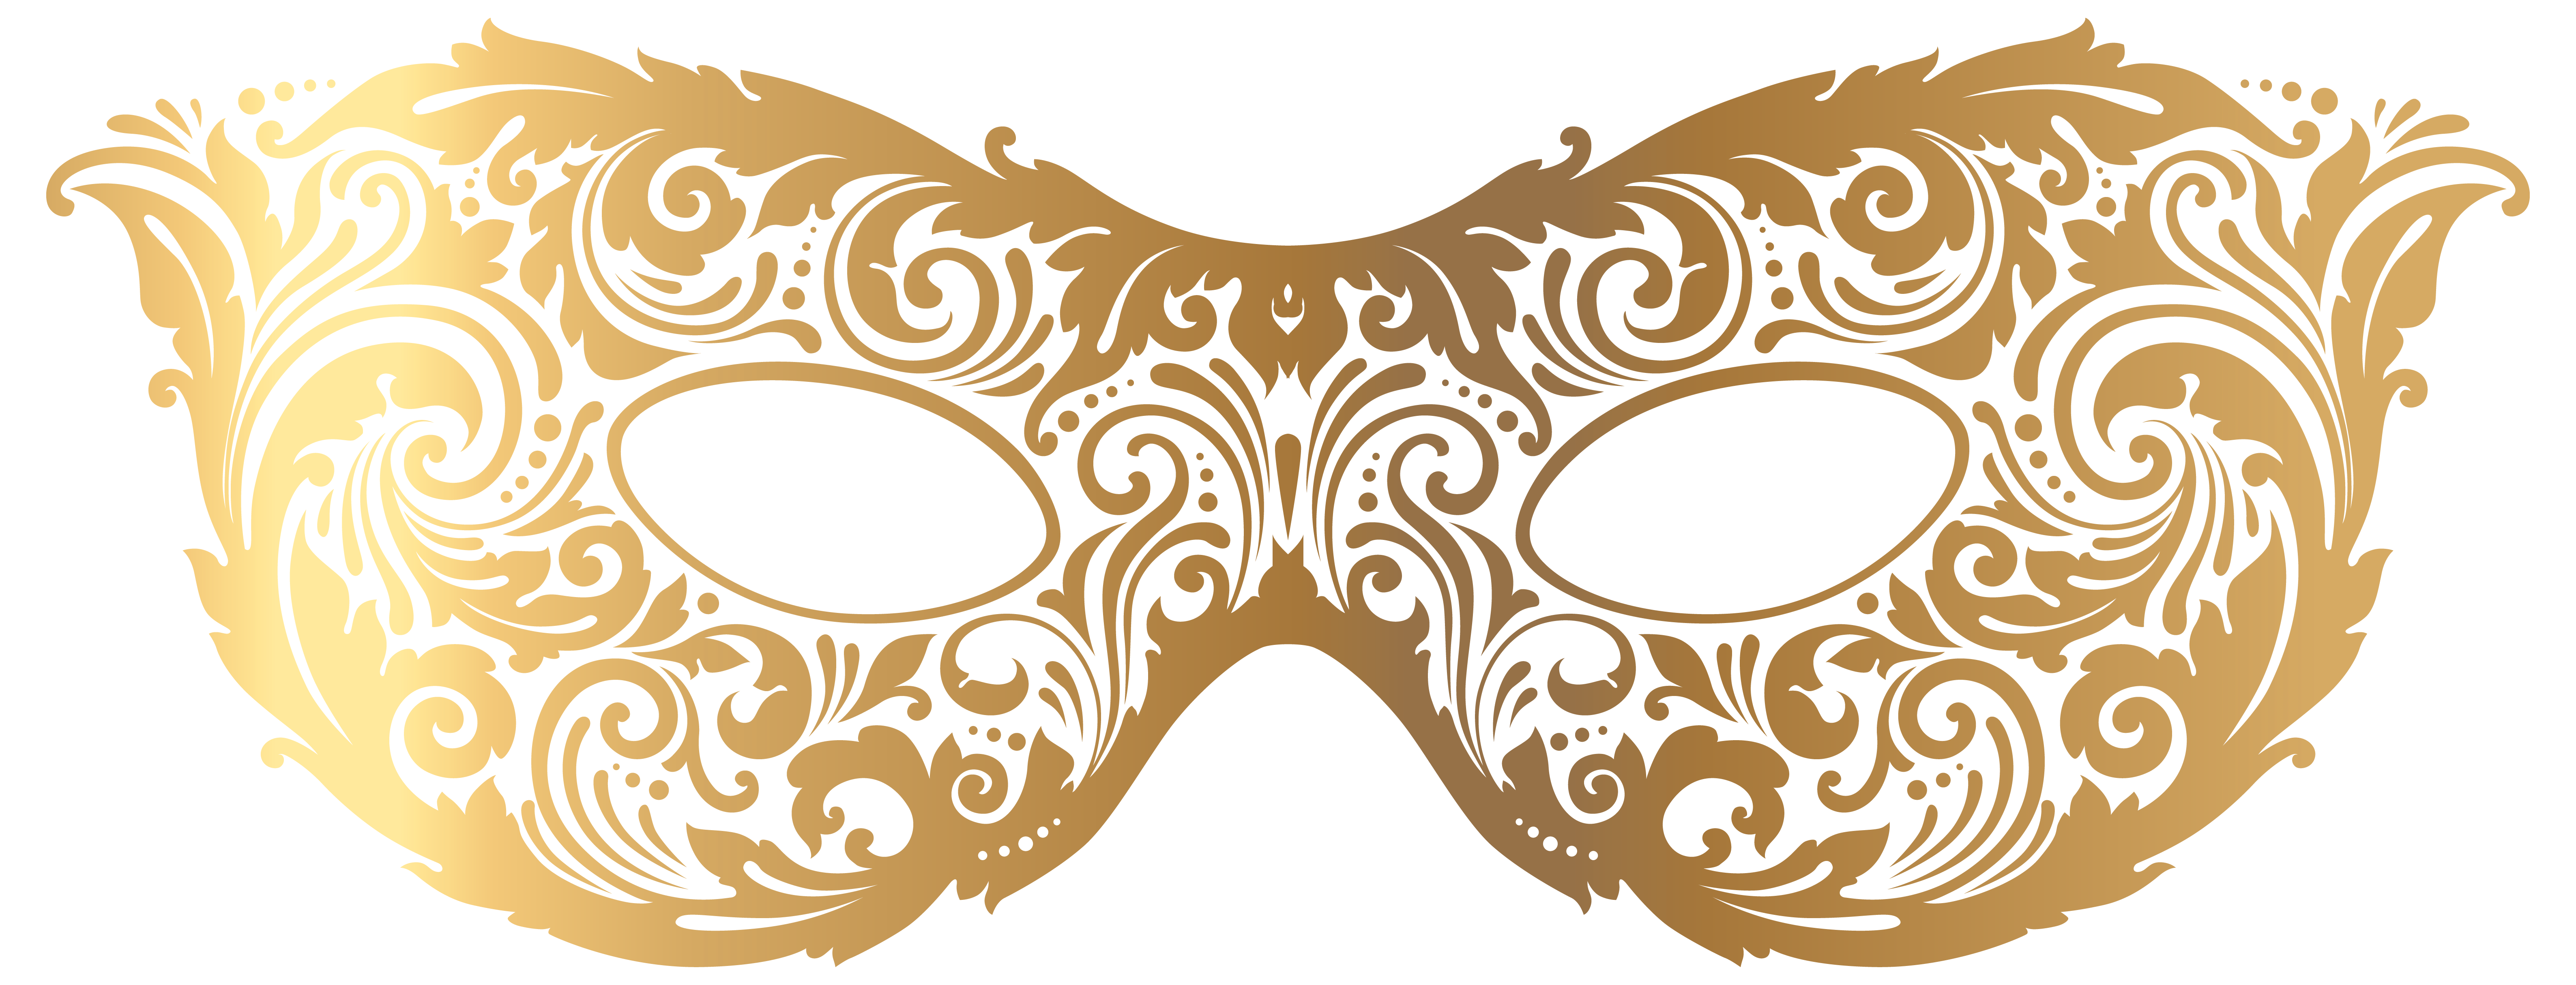 Festival clipart carnival festival. Download mask free png